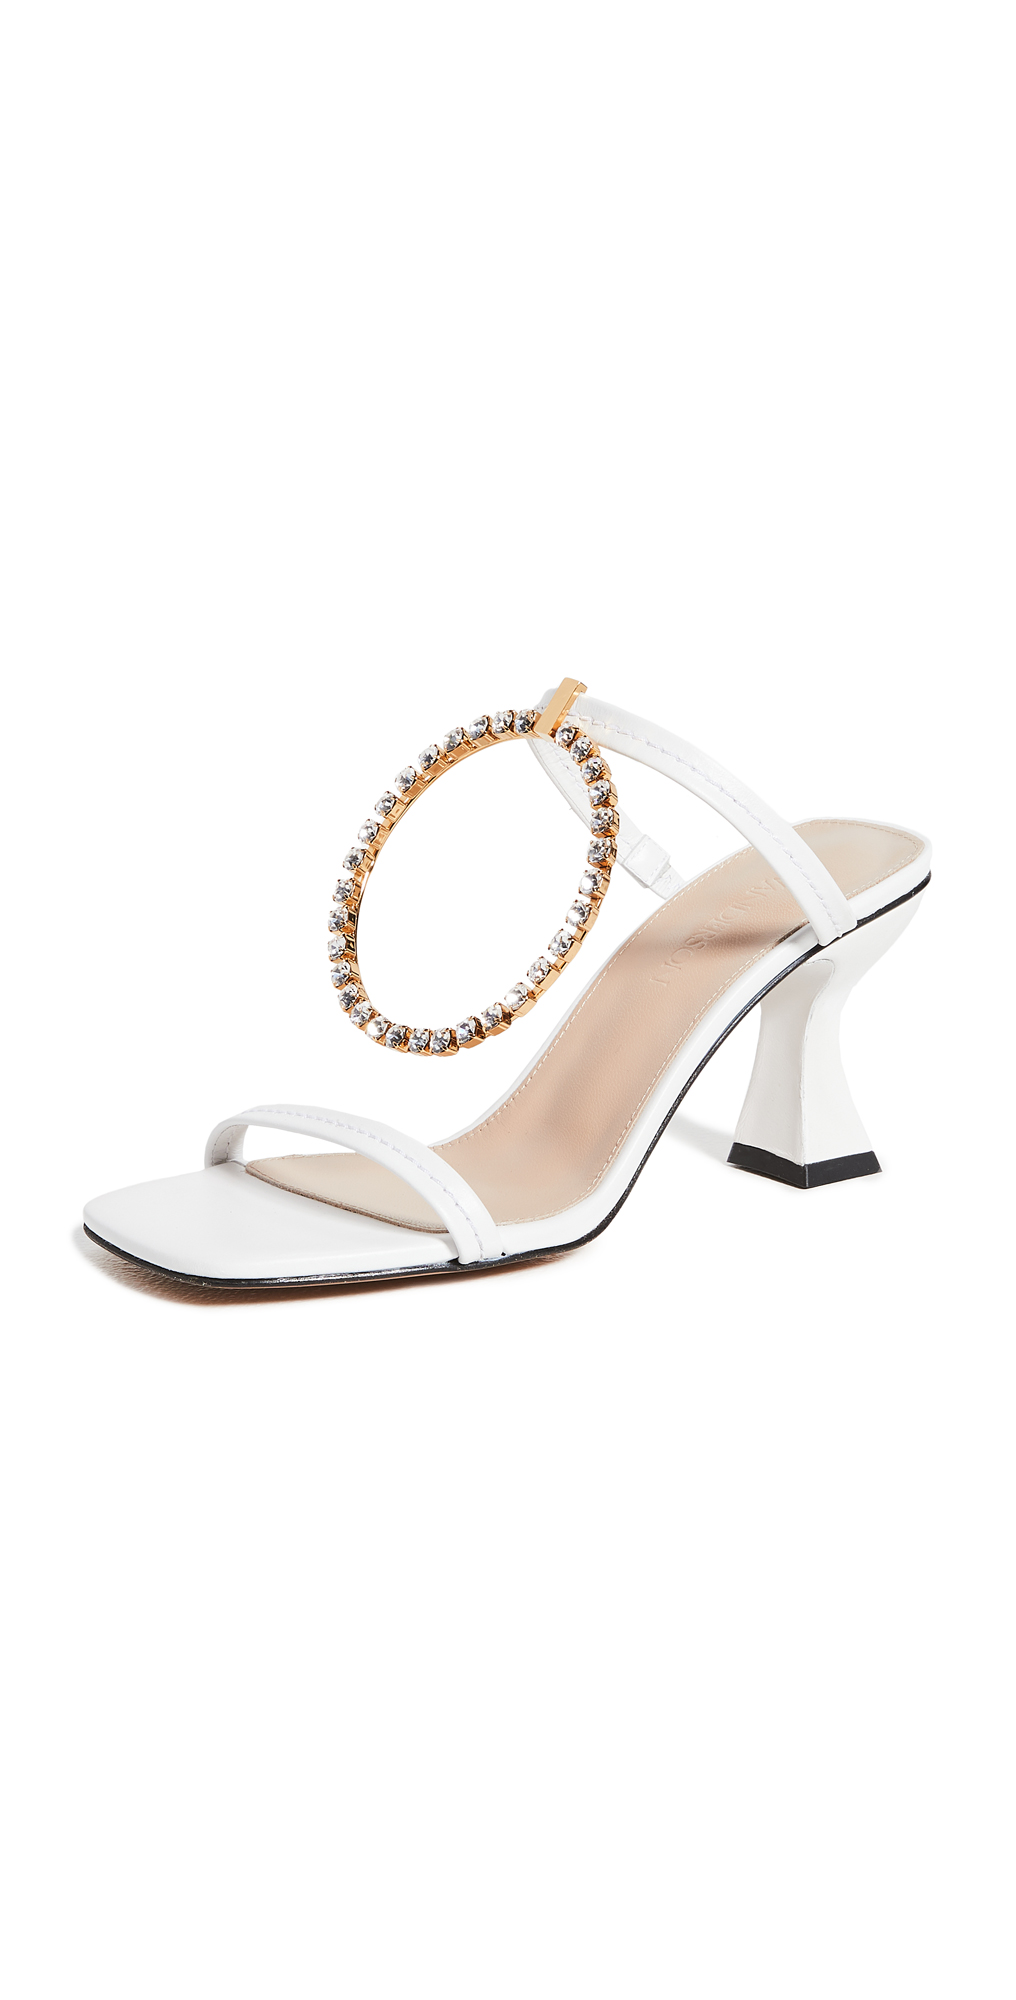 JW Anderson Crystal Buckle Sandals